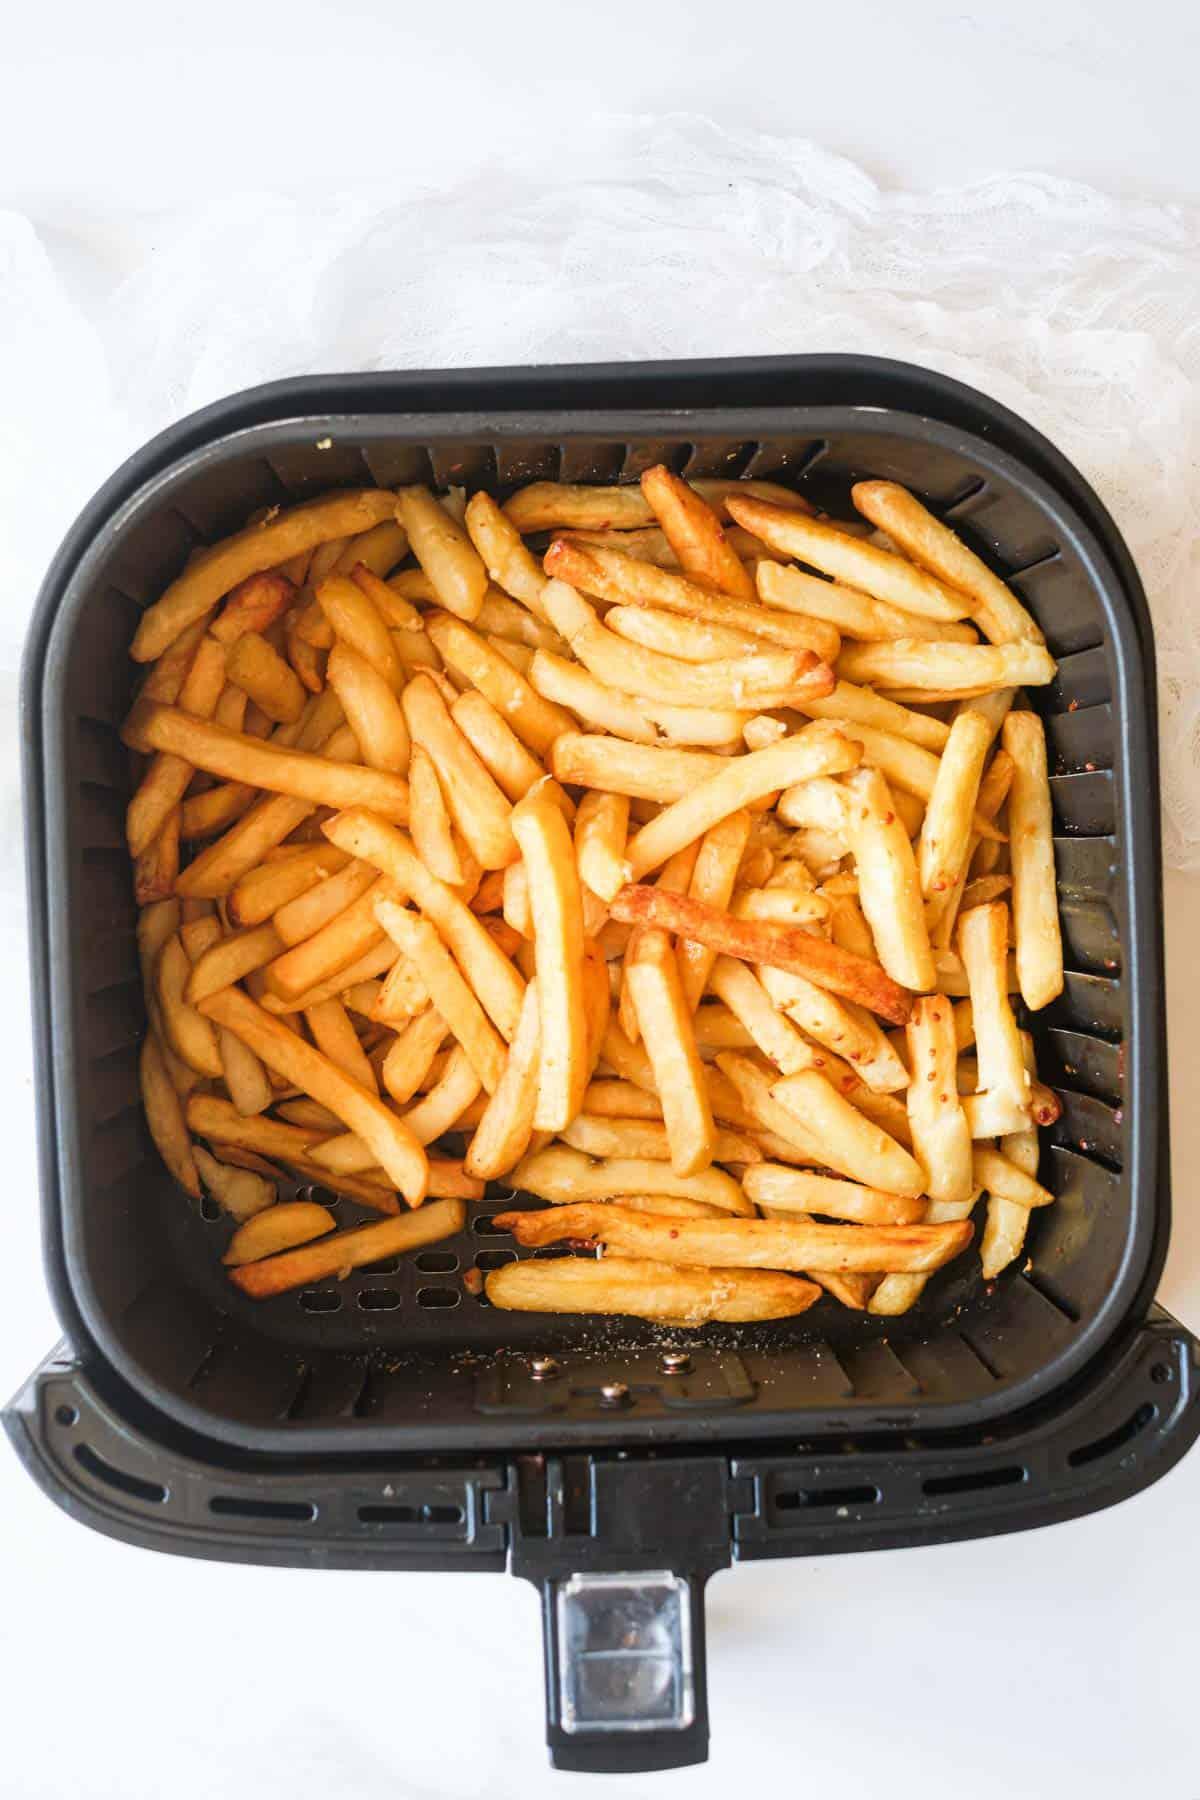 garlic parmesan fries inside the air fryer basket